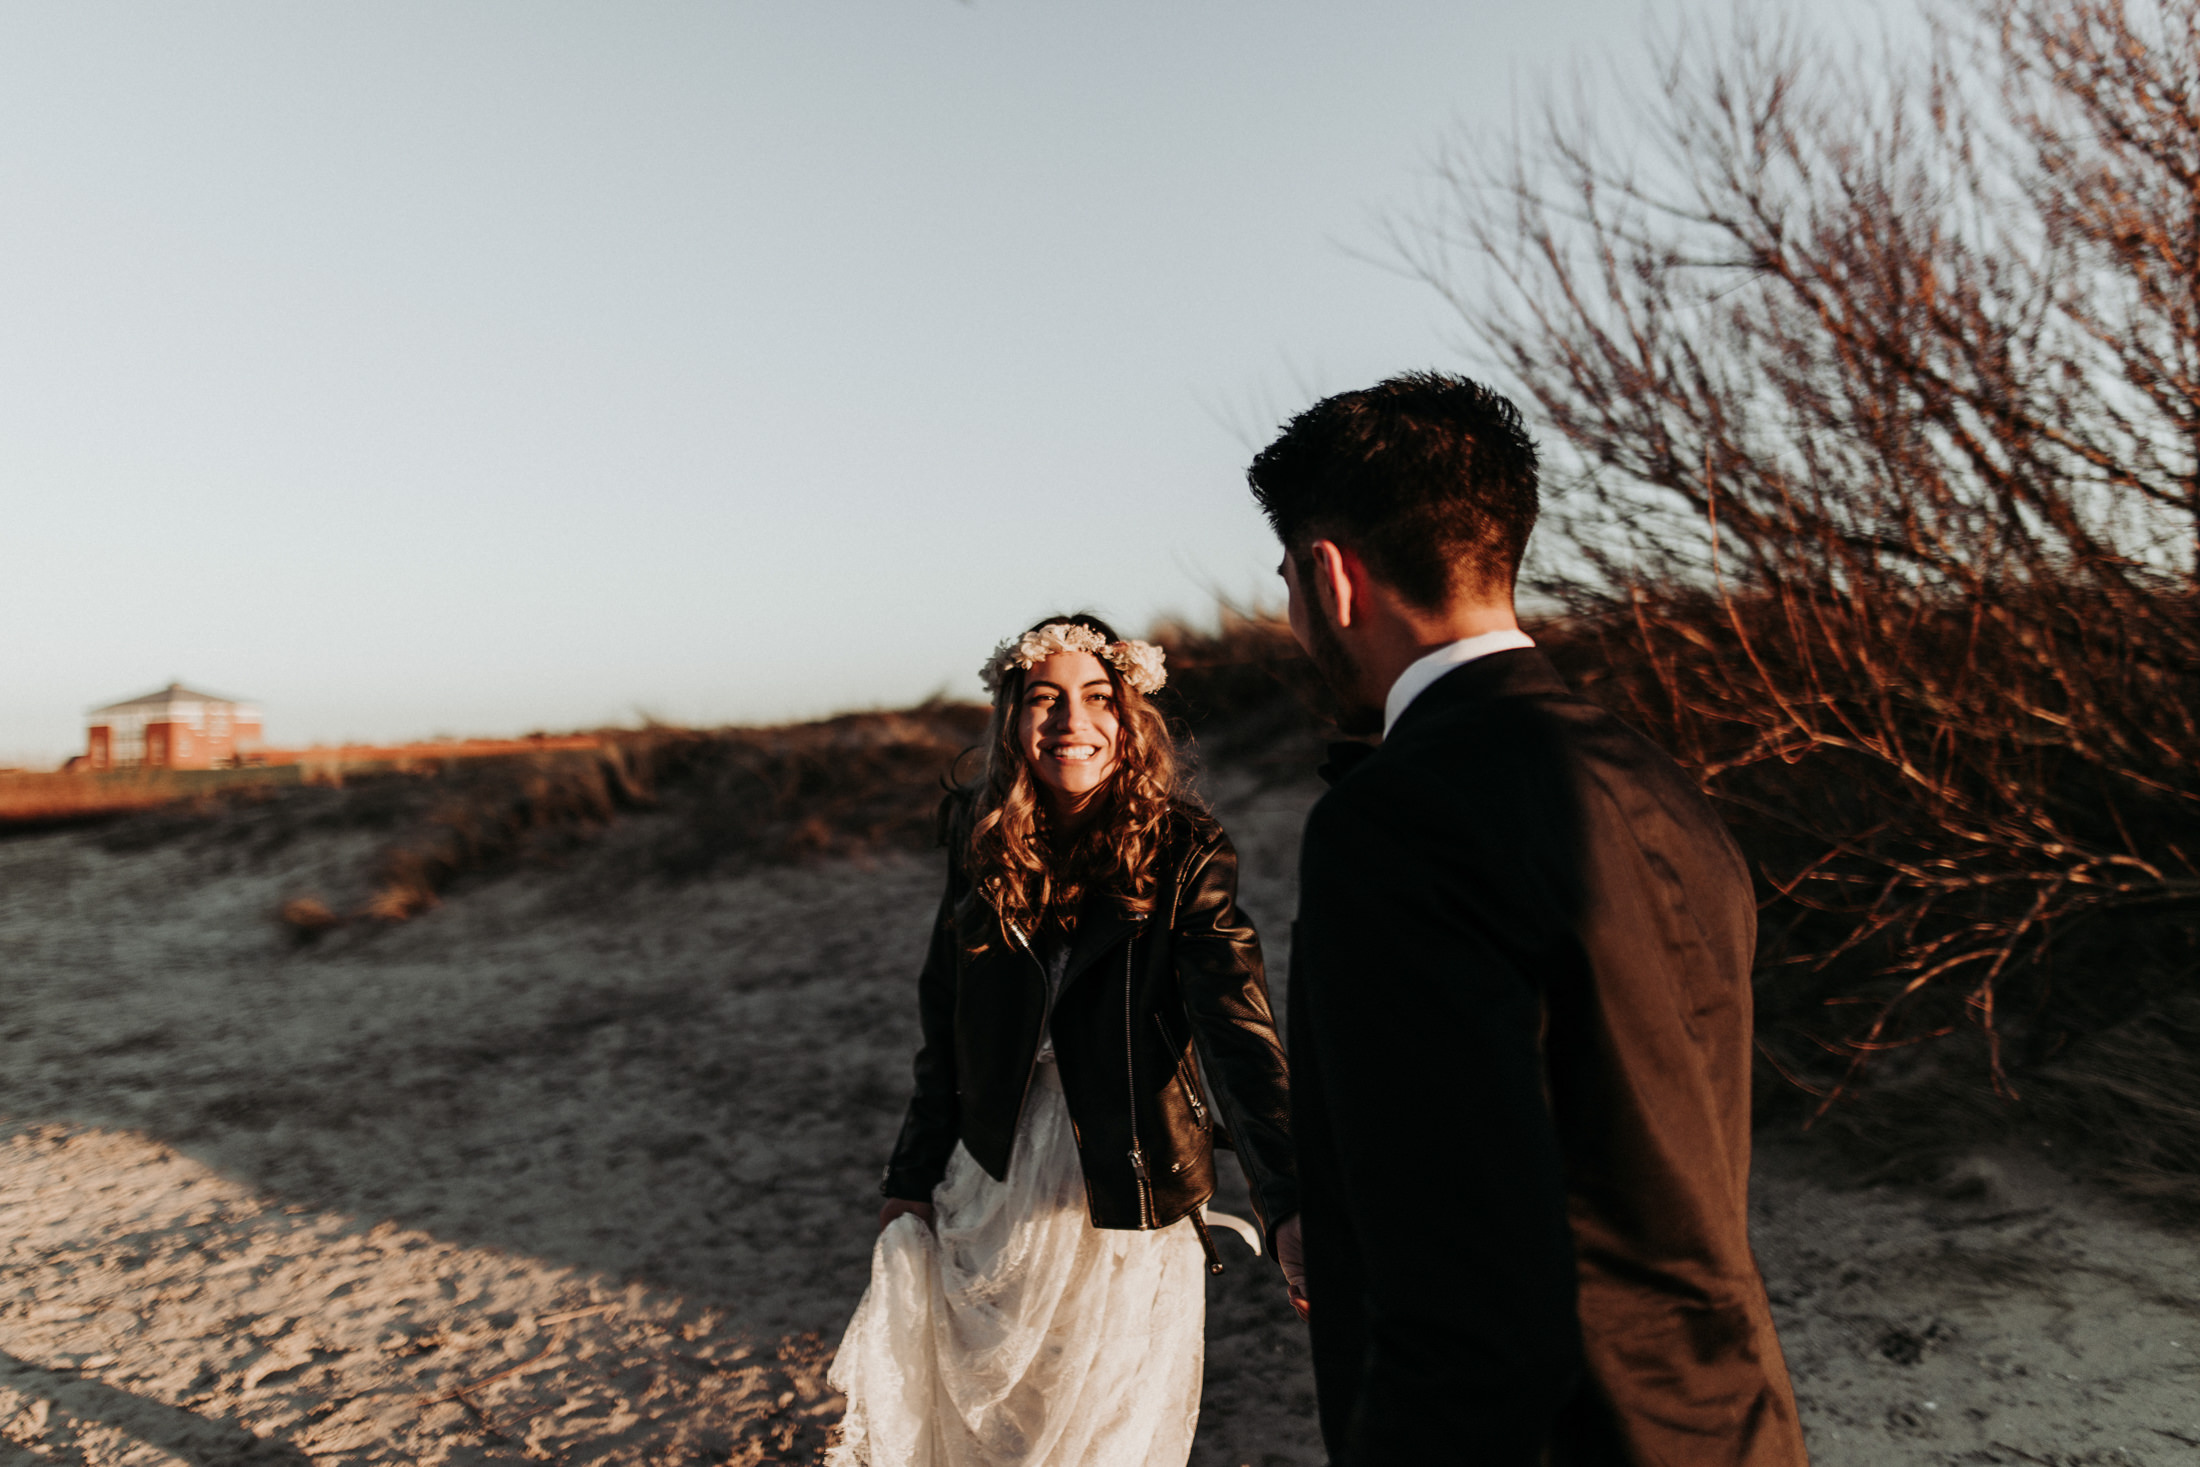 Wedding_Photographer_Mallorca_Daniela-Marquardt_Photography_CanaryIslands_Lanzarote_Iceland_Tuskany_Santorini_Portugal_Schweiz_Austria_Bayern_Elopement_Hochzeitsfotograf_Norddeichich_9